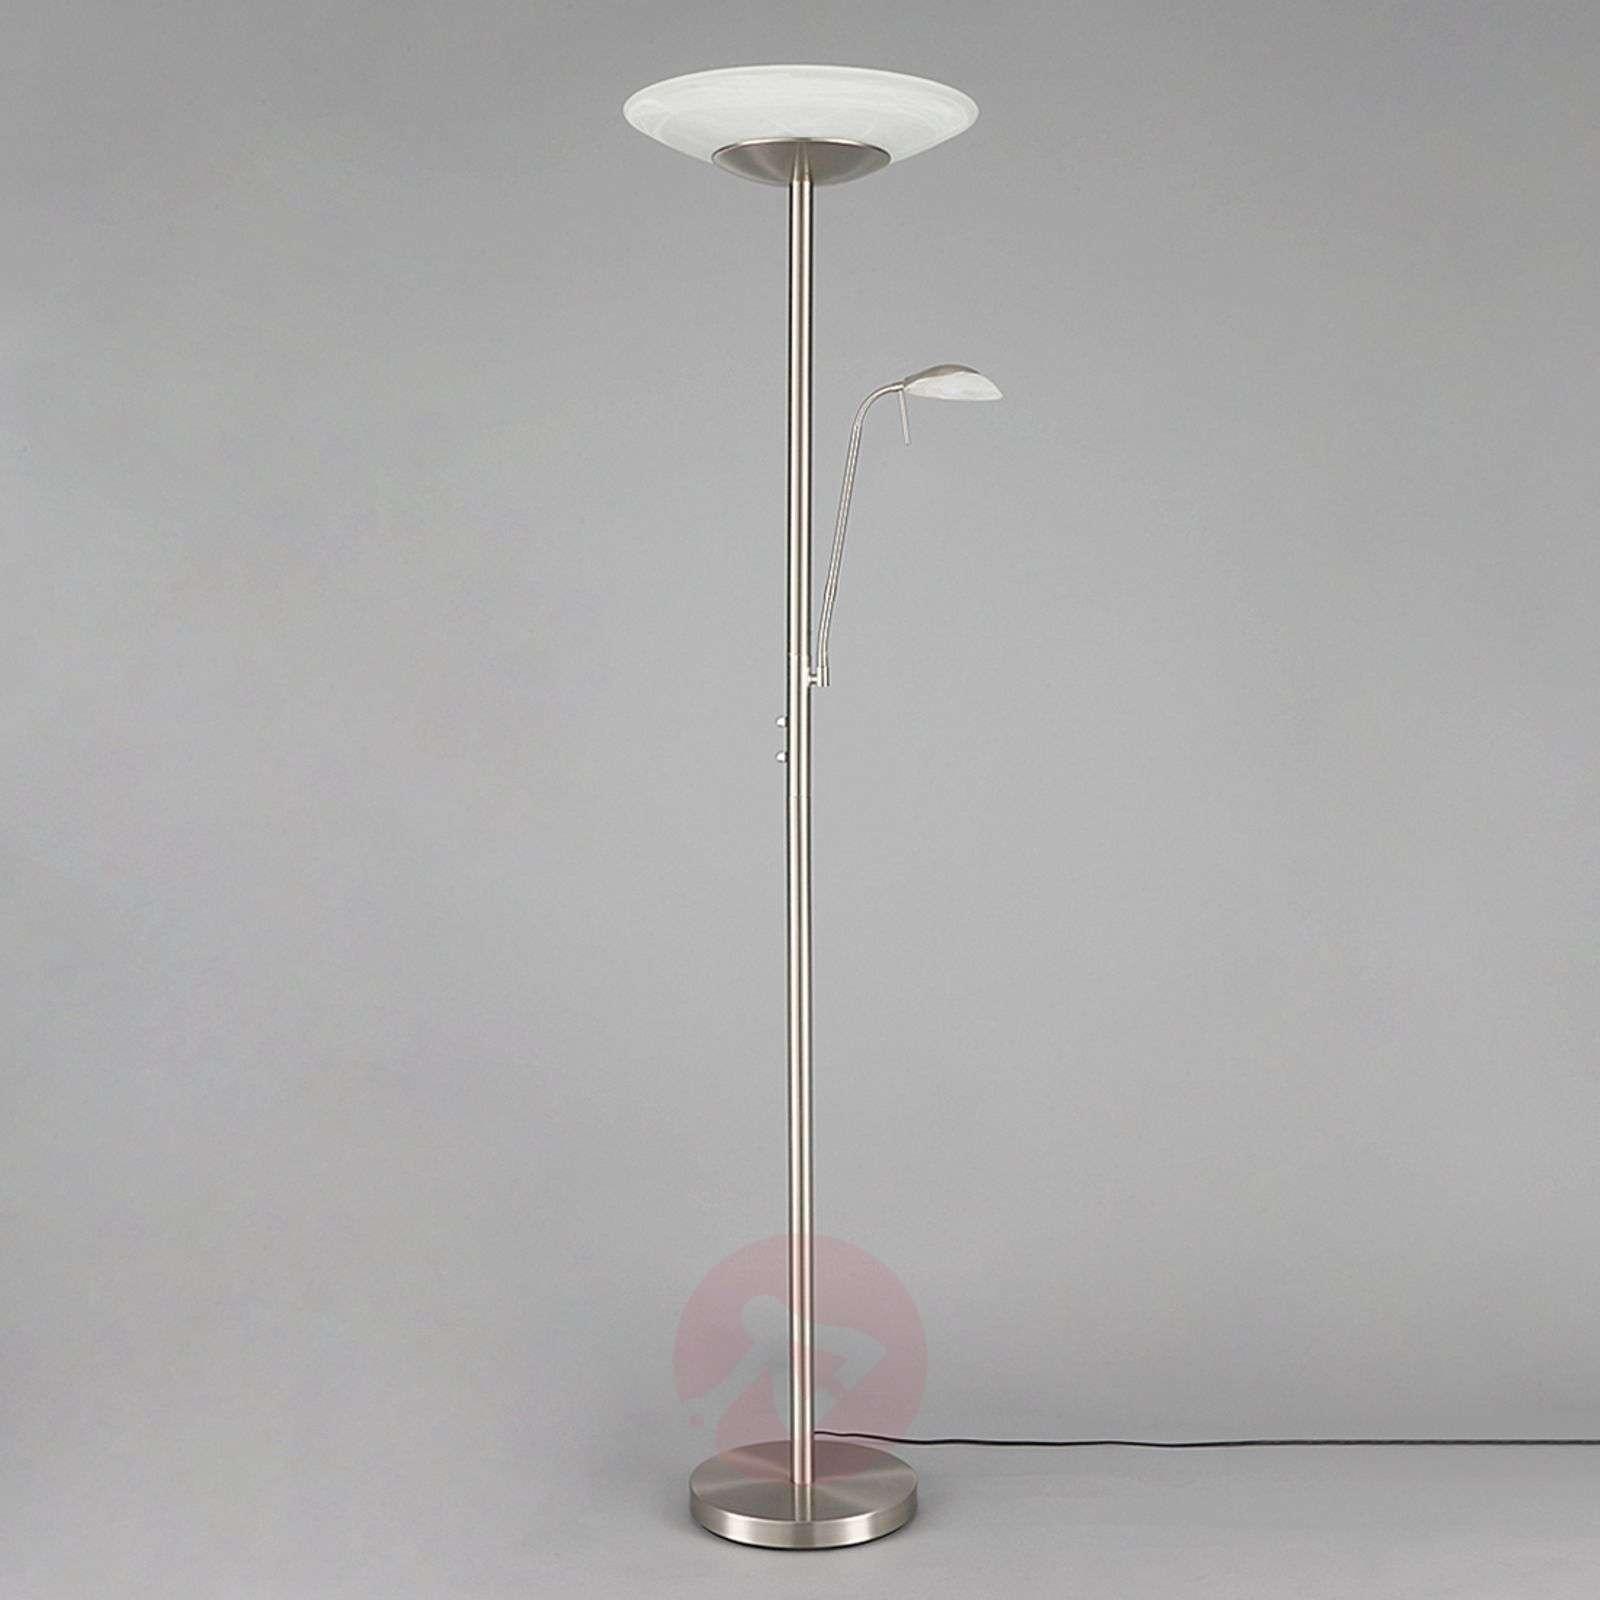 LED-lattiavalaisin Ragna lukuvalolla,matta nikkeli-9620651-03